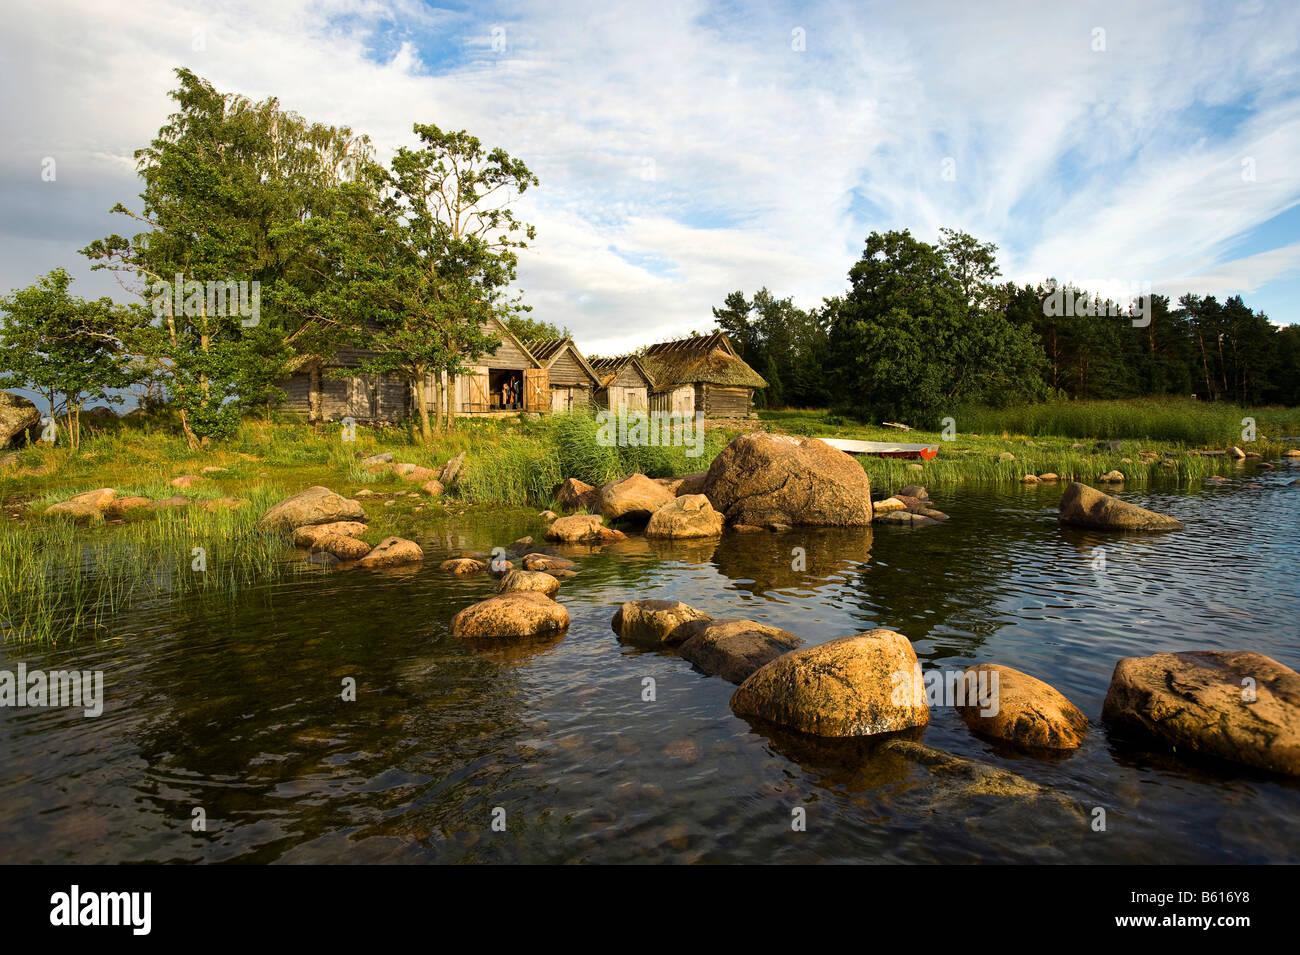 Fishing village altja lahemaa national park estonia baltic states northeastern europe